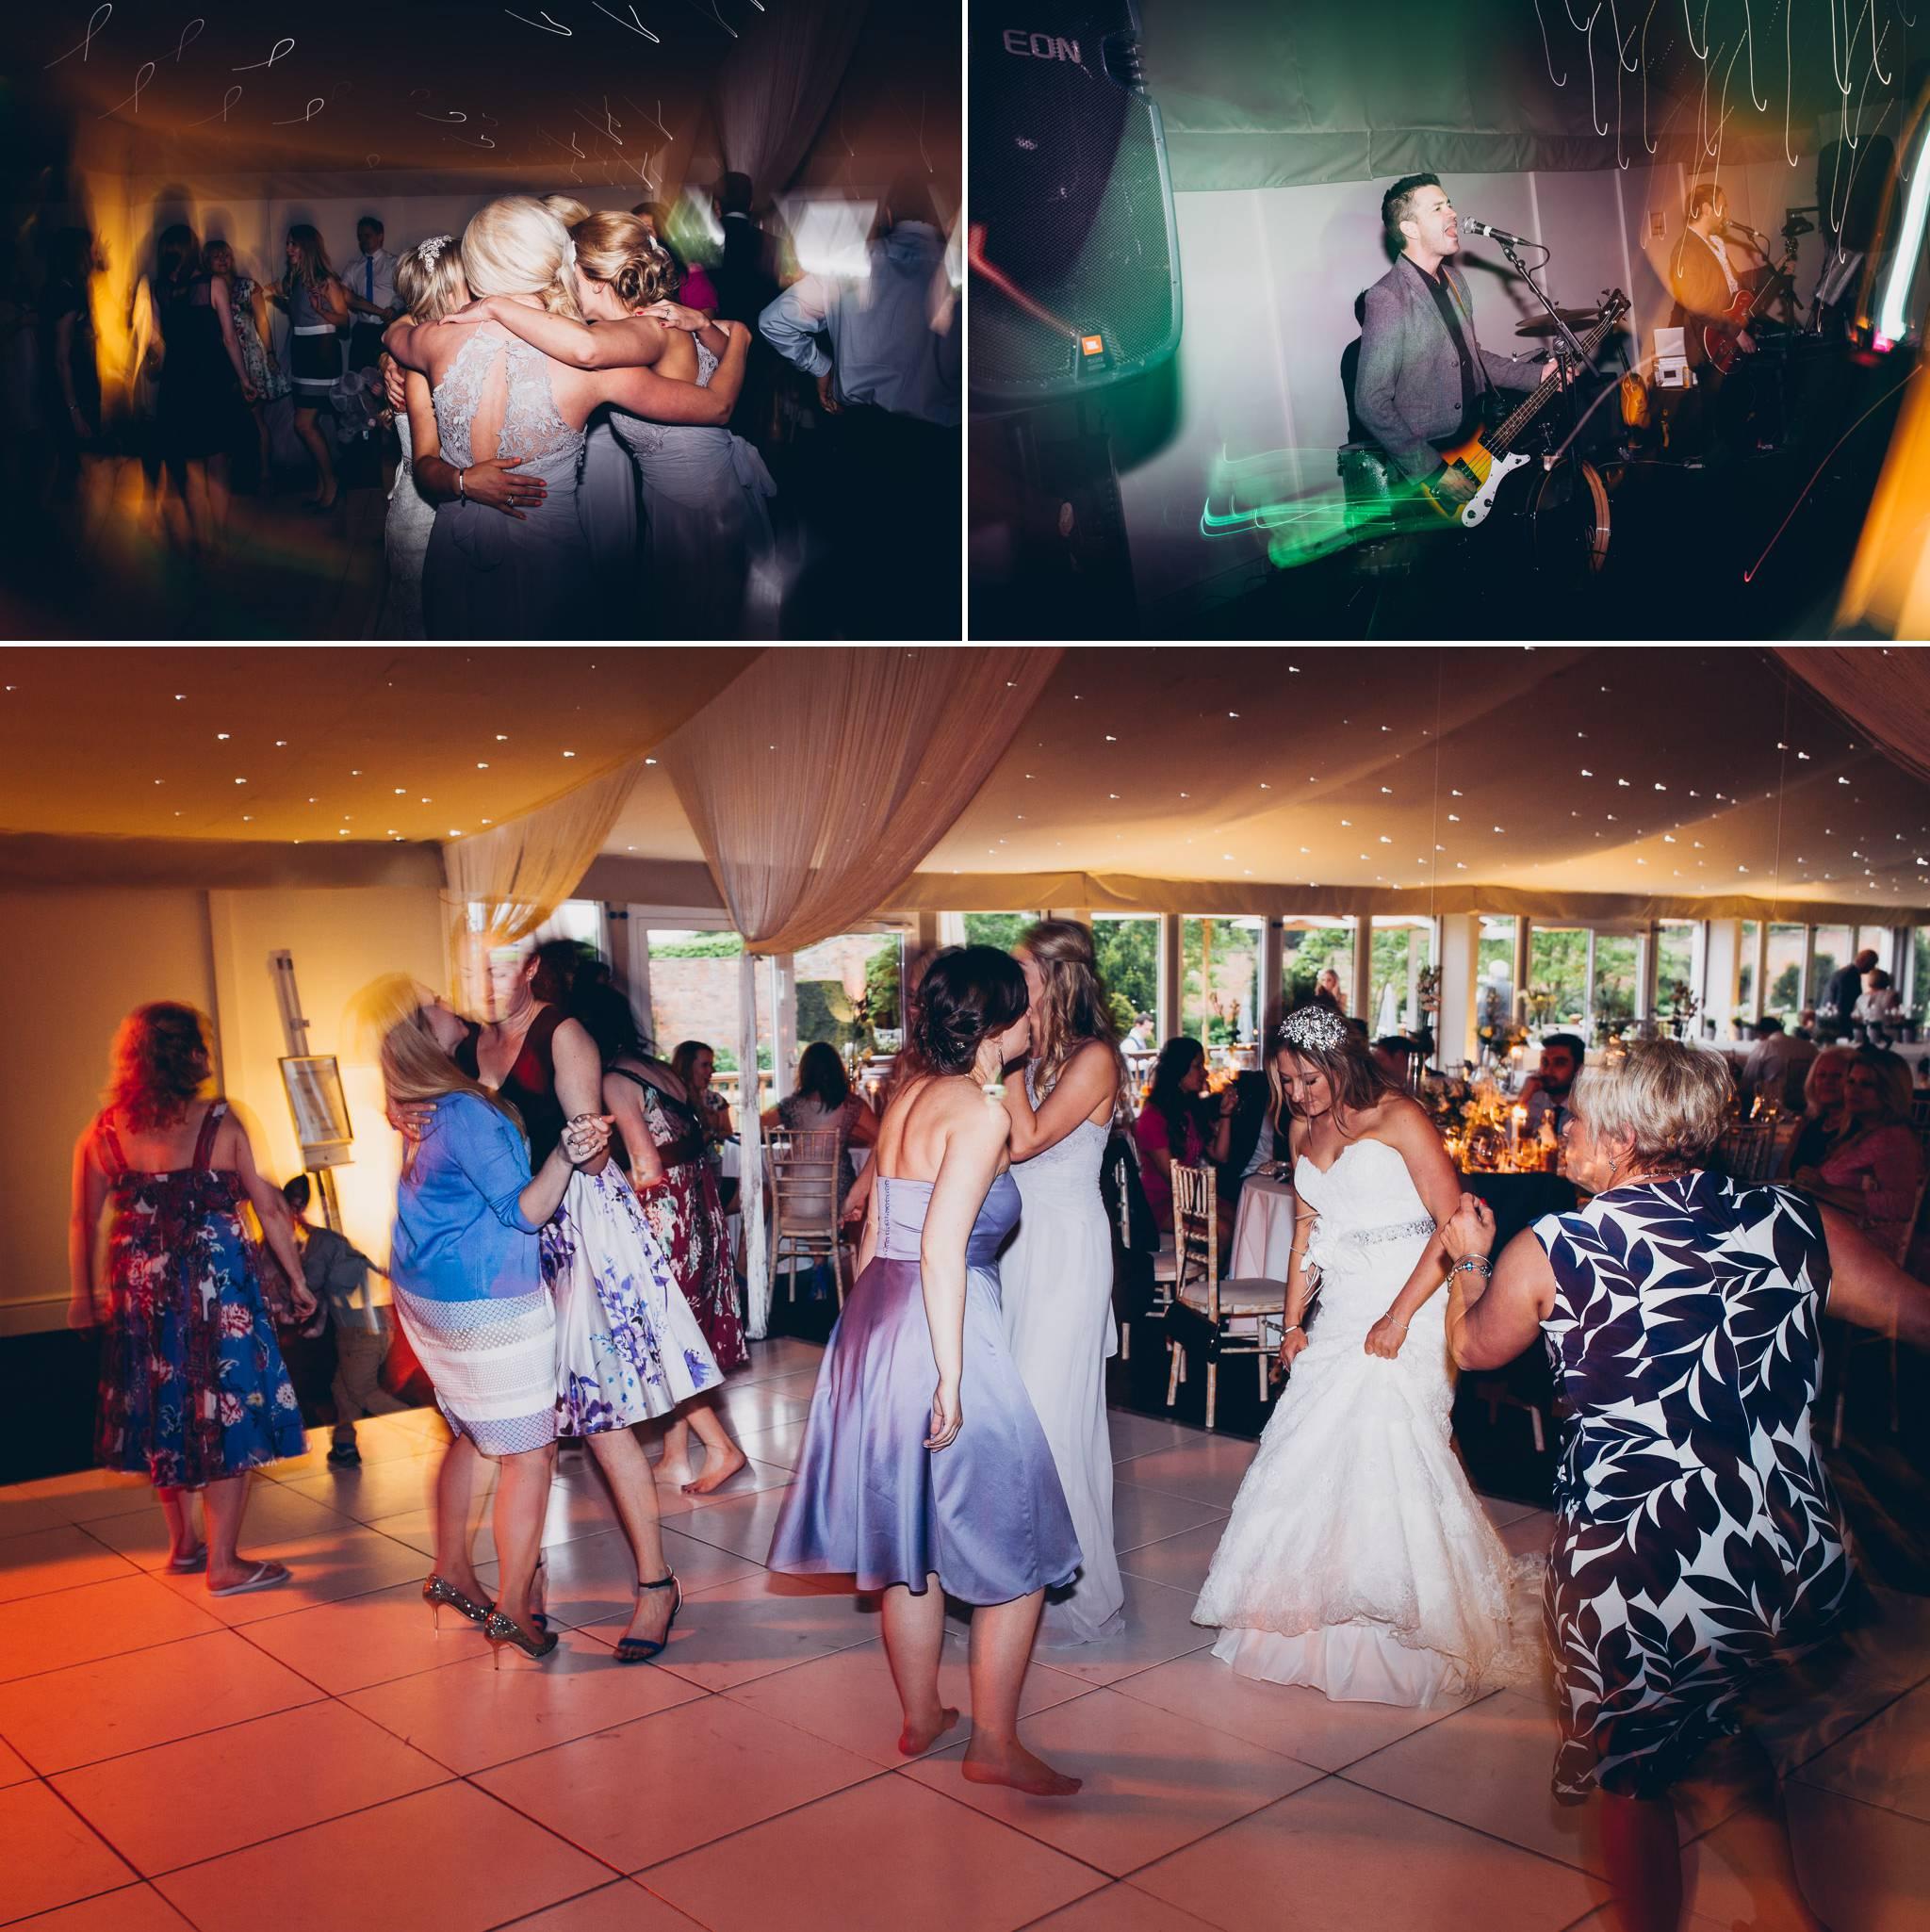 shropshire-wedding-photography 40.jpg